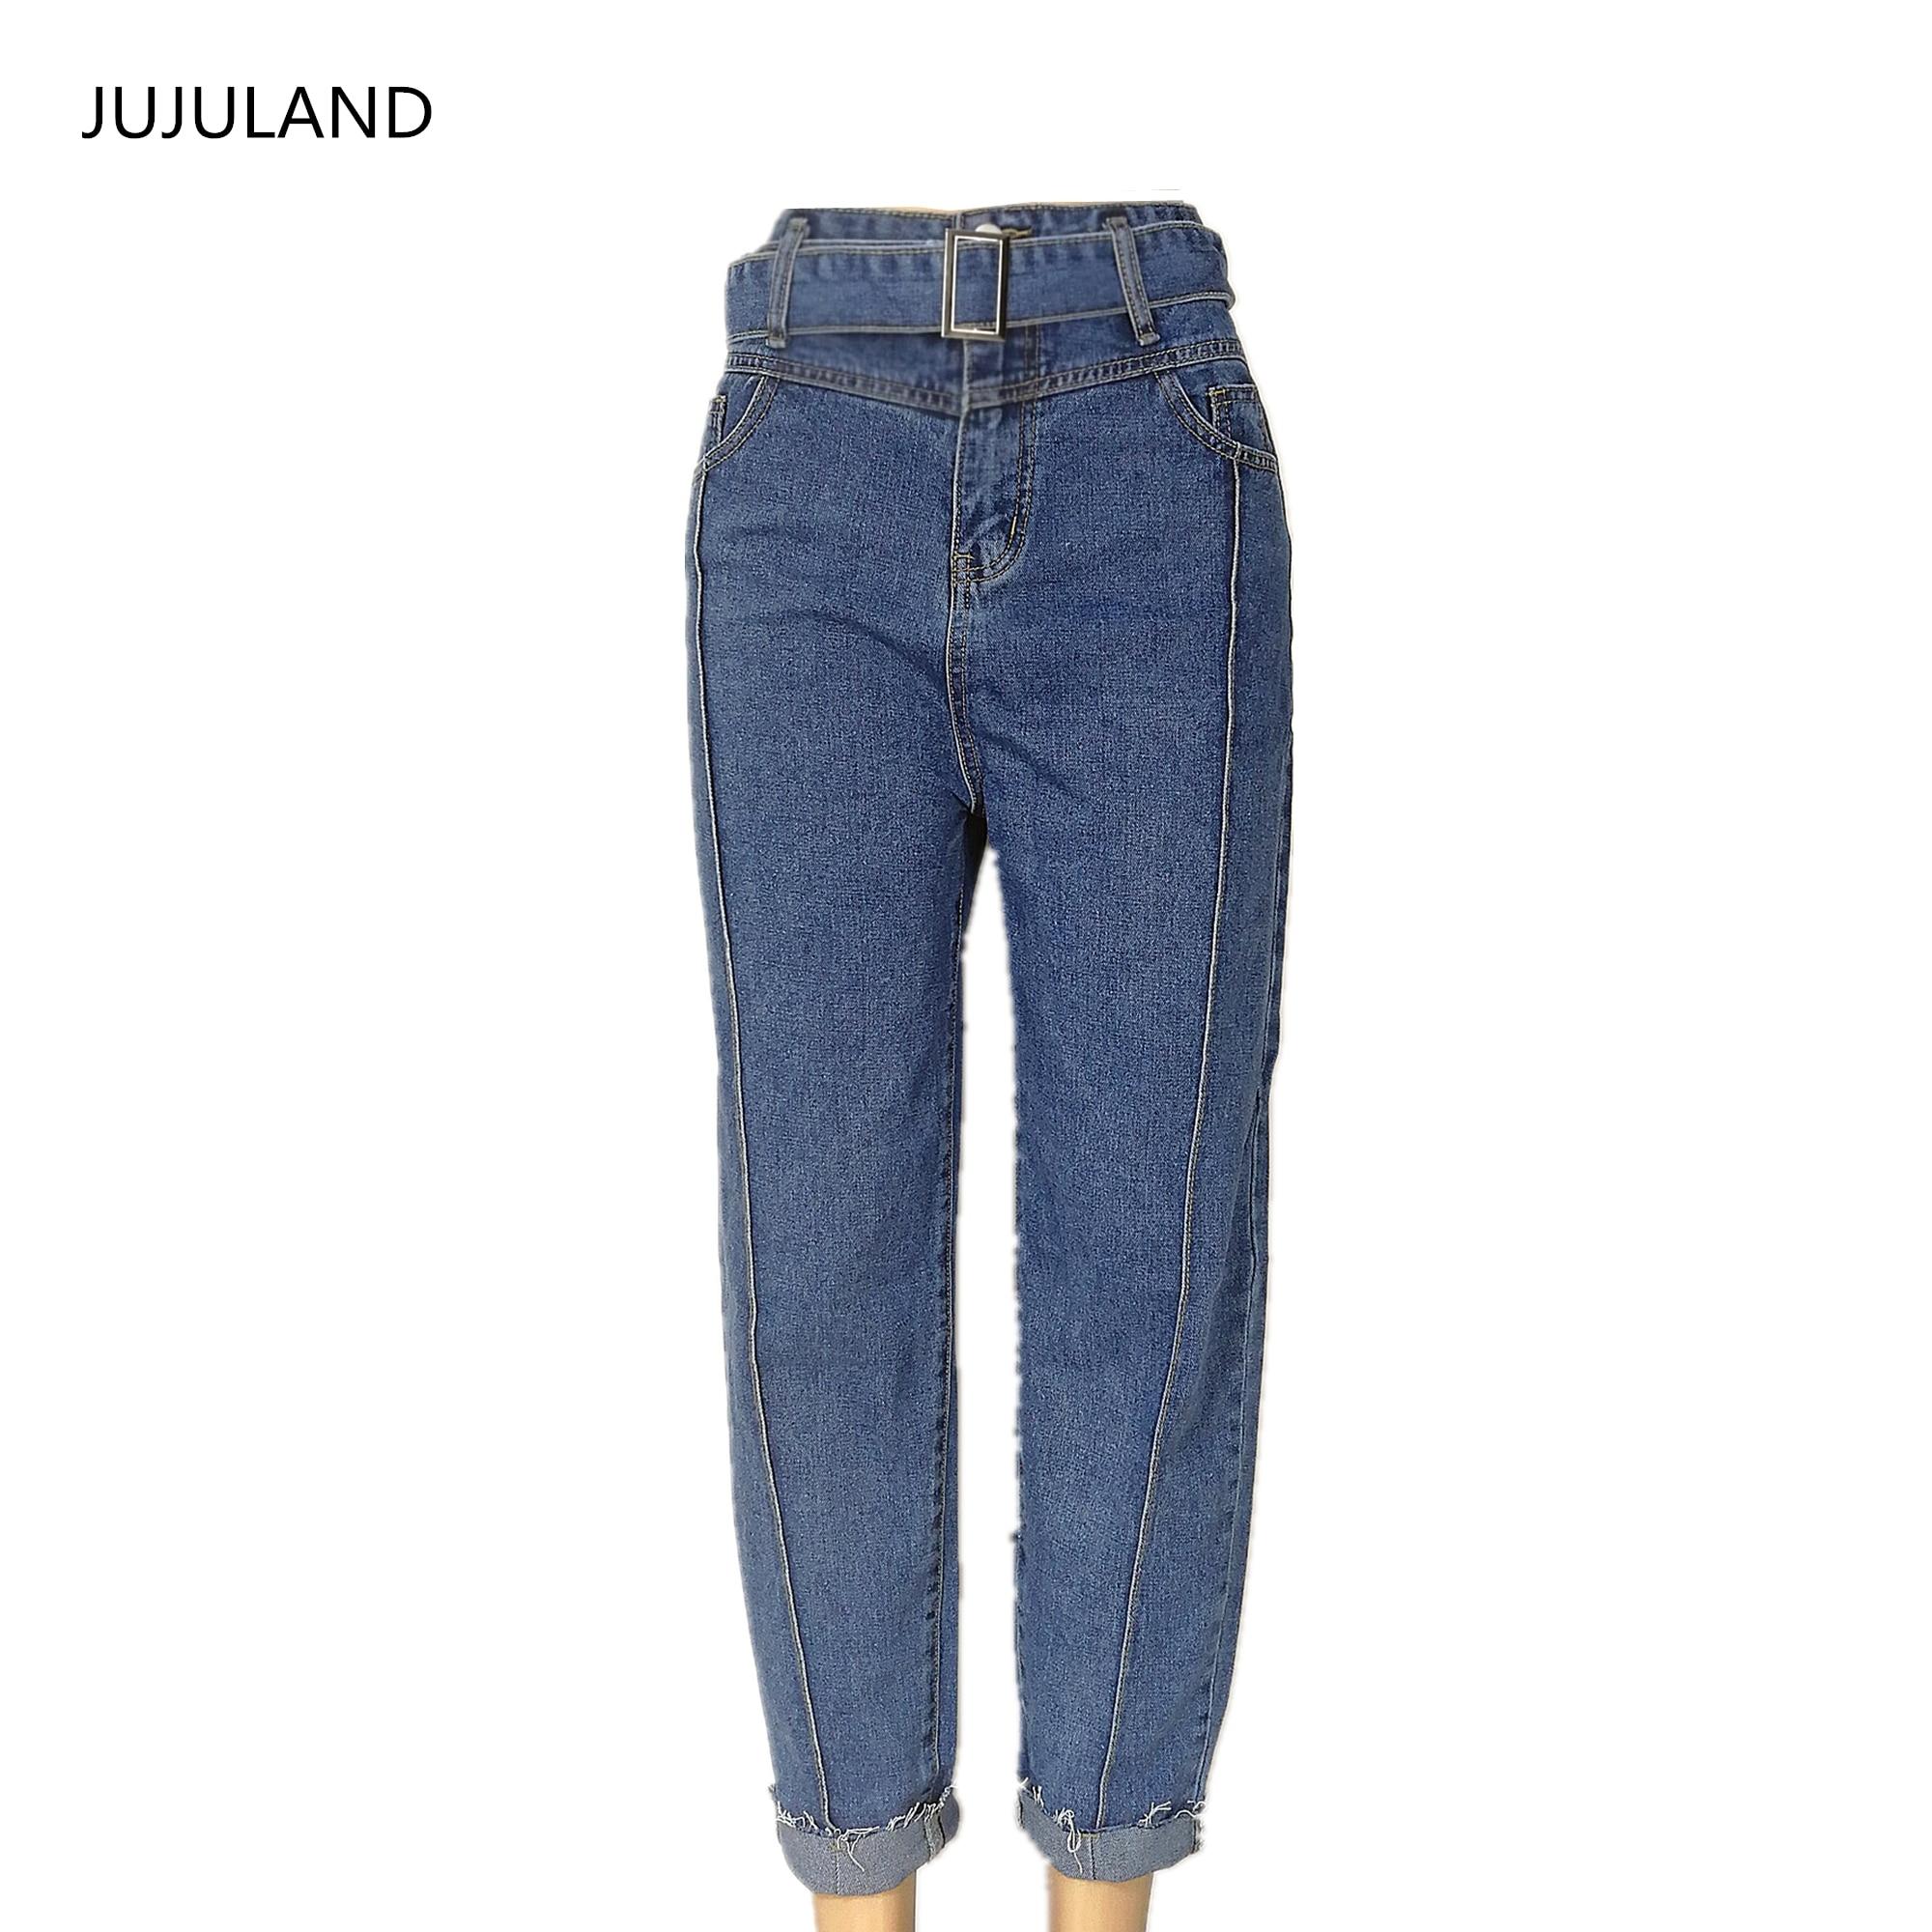 JUJULAND  High Waist Jeans Women Streetwear Bandage Denim Plus Size Jeans Femme Stright-leg Pants Skinny Button Jeans Woman 2009